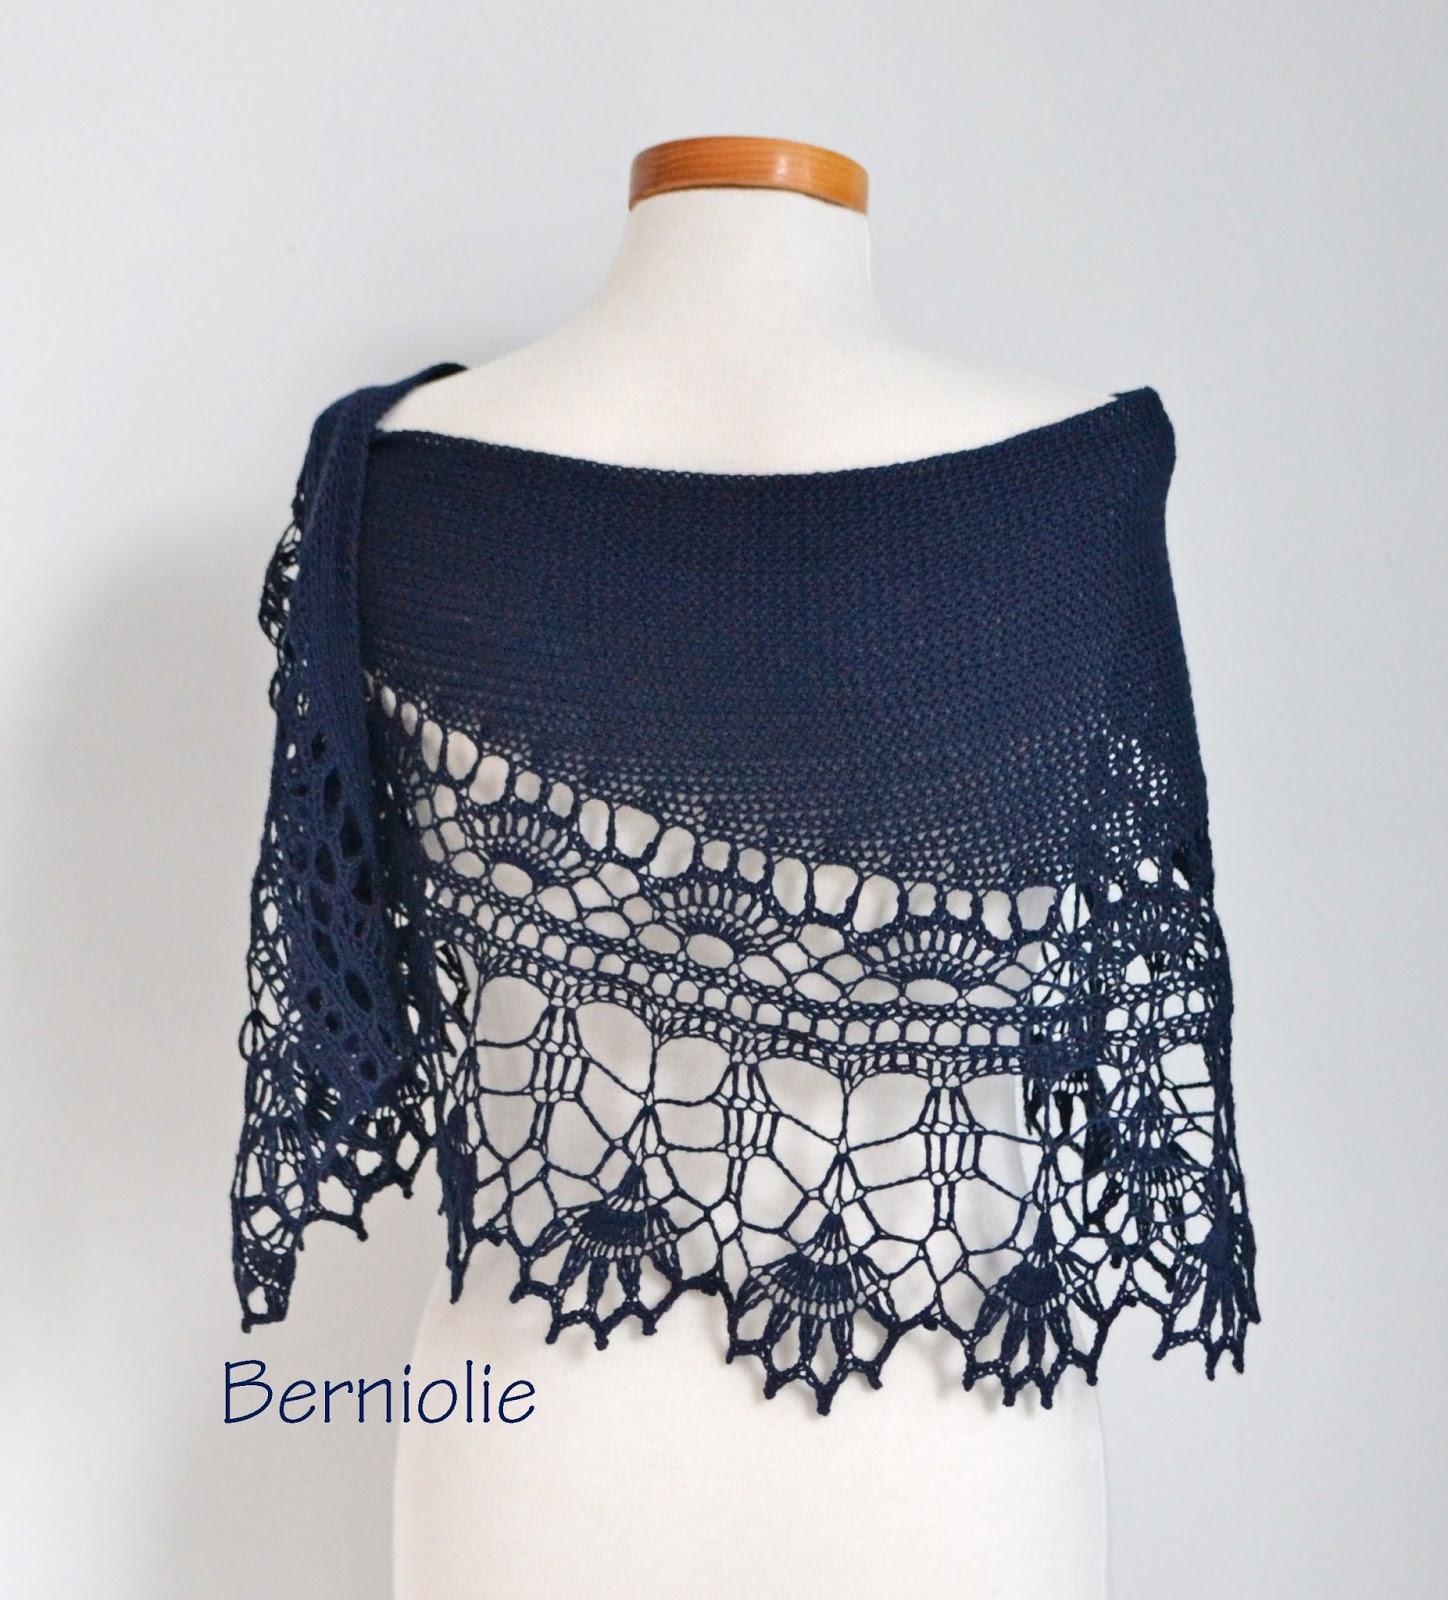 Berniolie About